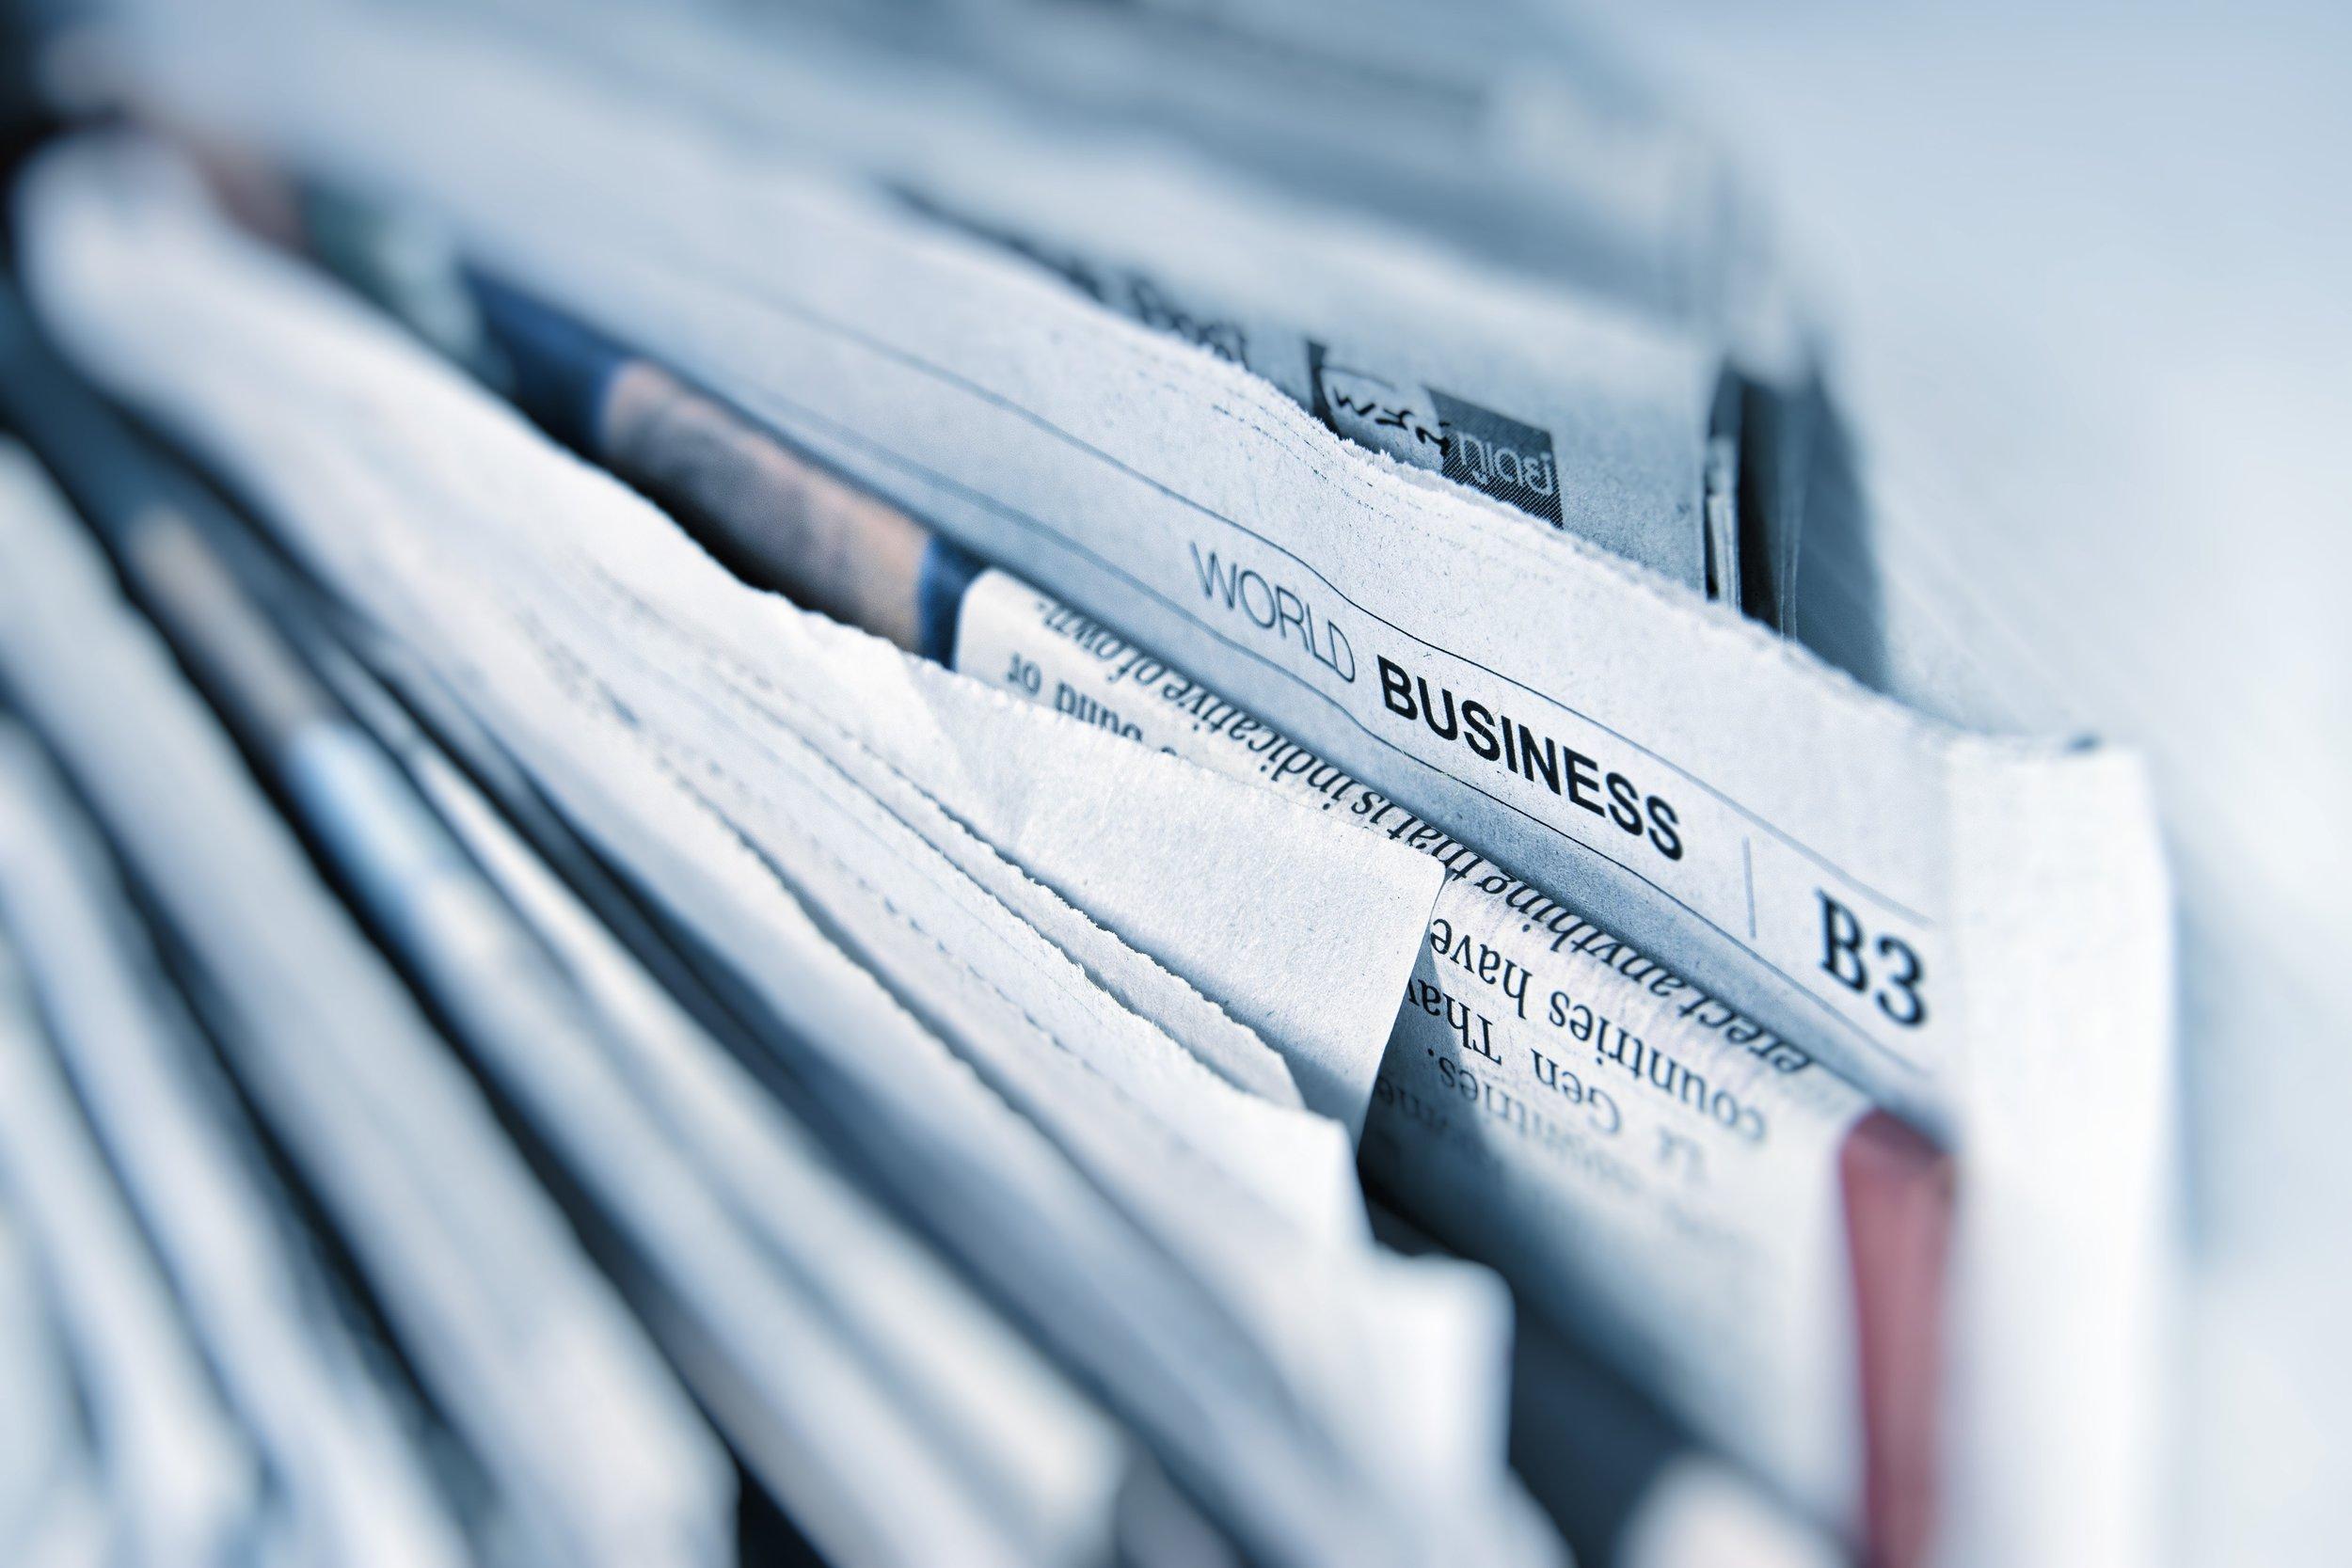 newspaperpr